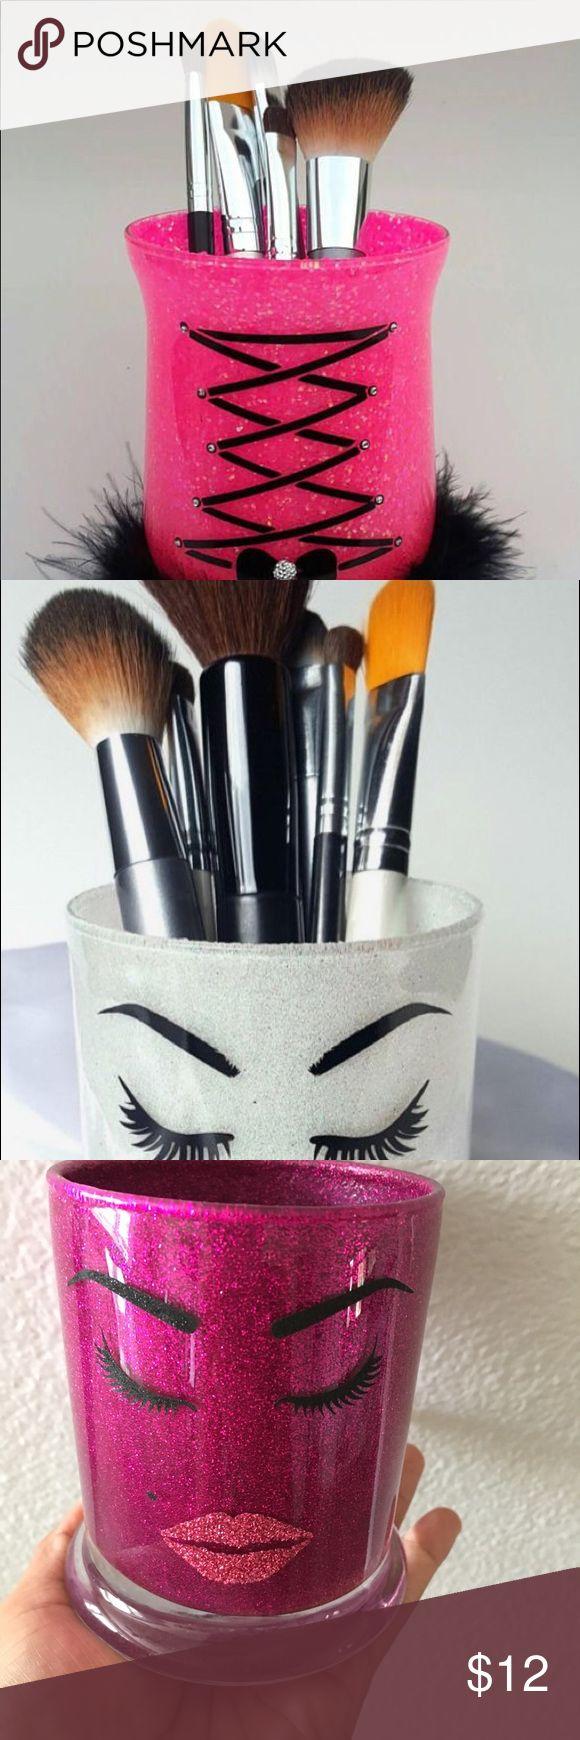 Glass Cup Holder Brush Makeup 💄 Glitter Brush. Makeup